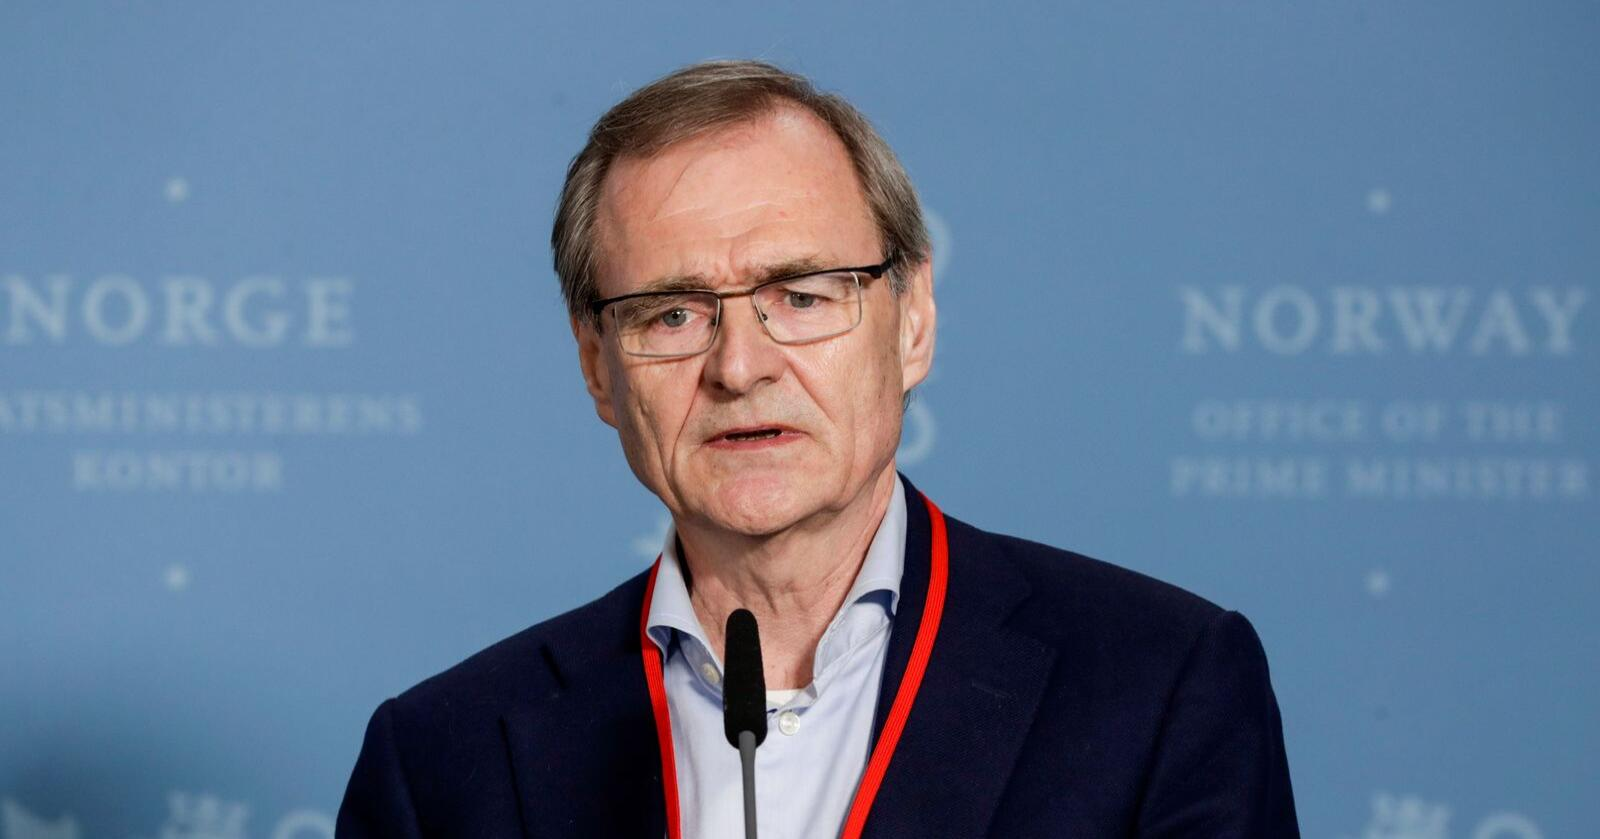 Lars Vorland la fram ekspertutvalgets rapport mandag. Foto: Berit Roald / NTB